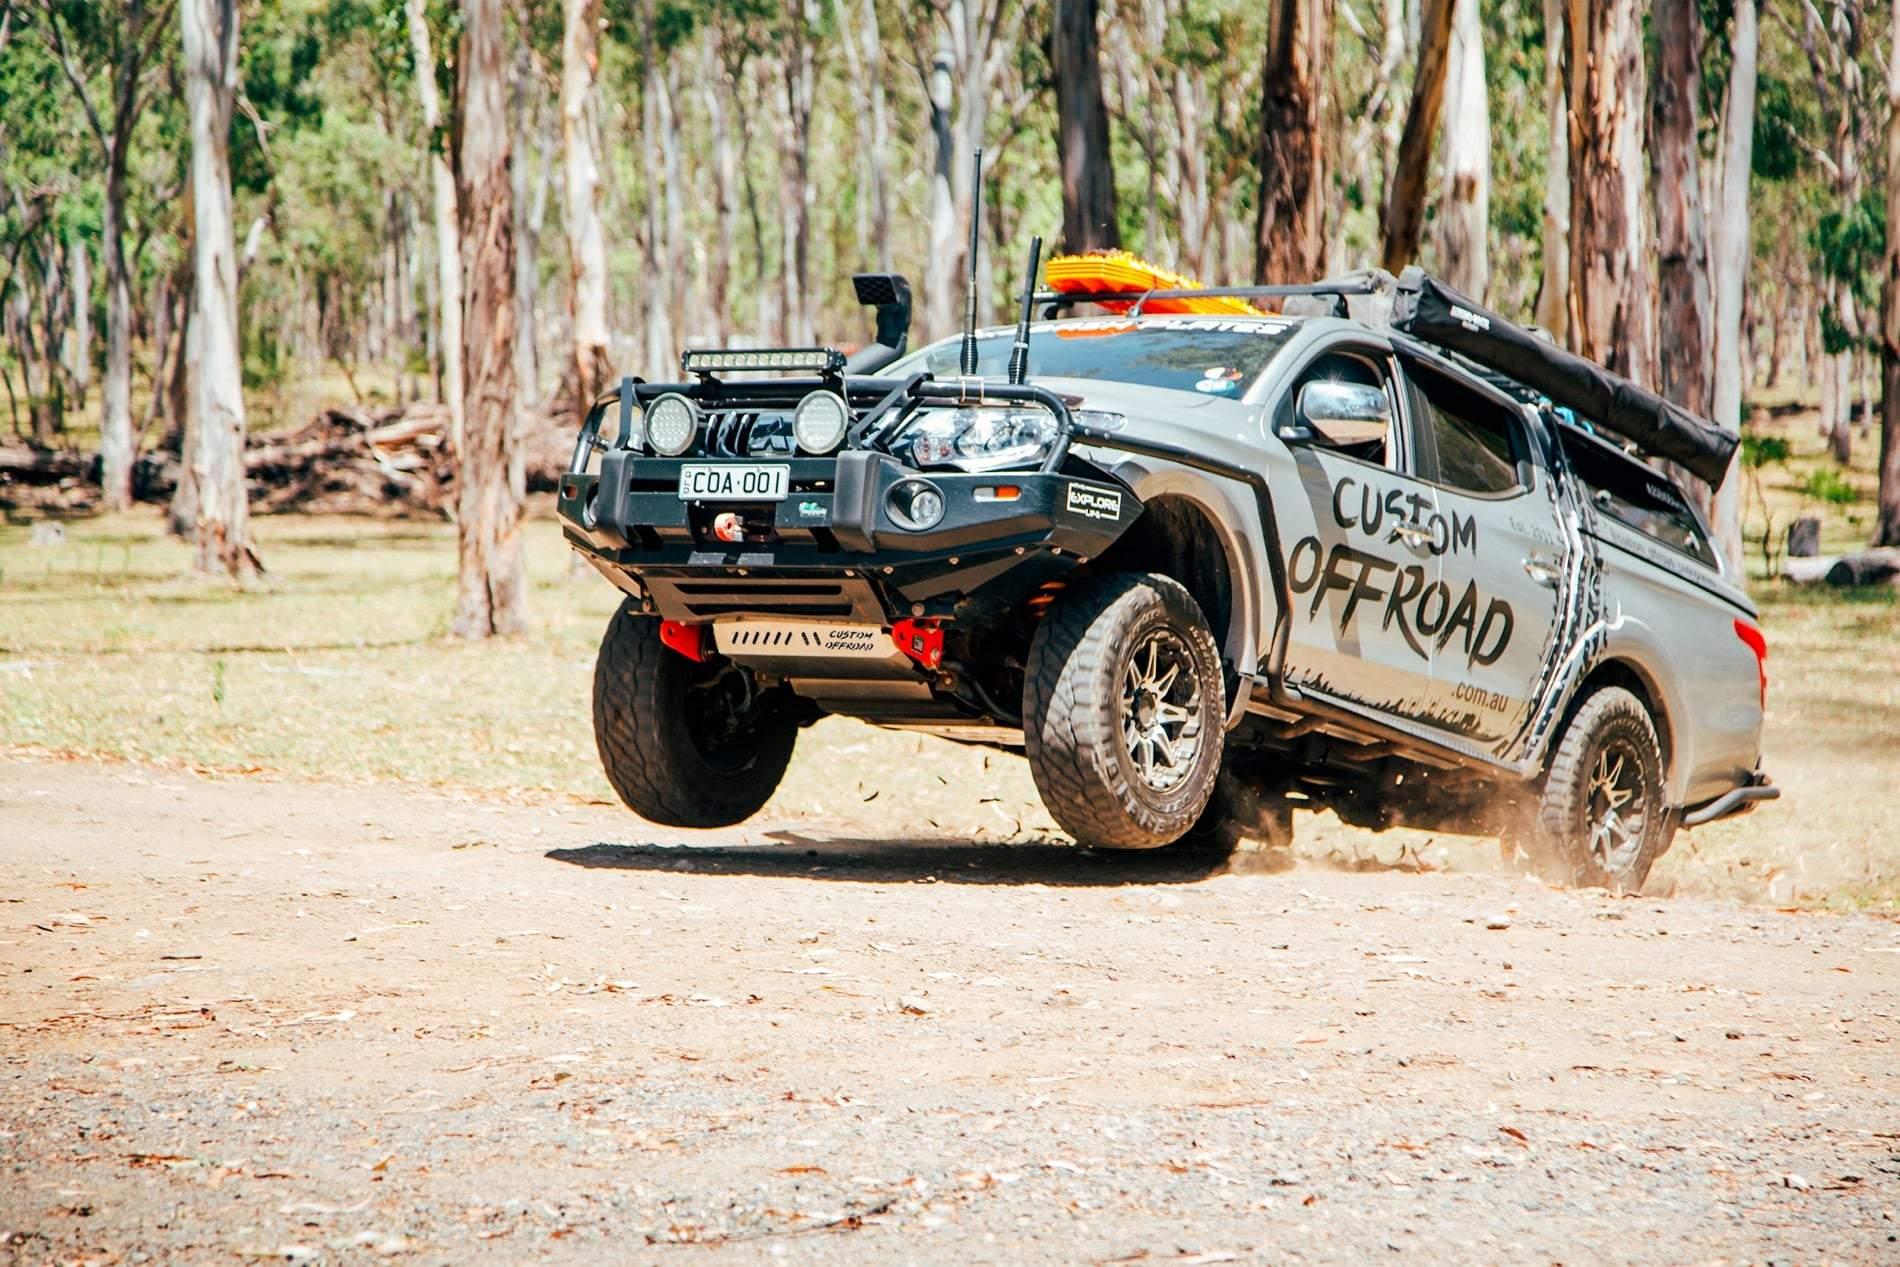 Custom Offroad 2020 4WD